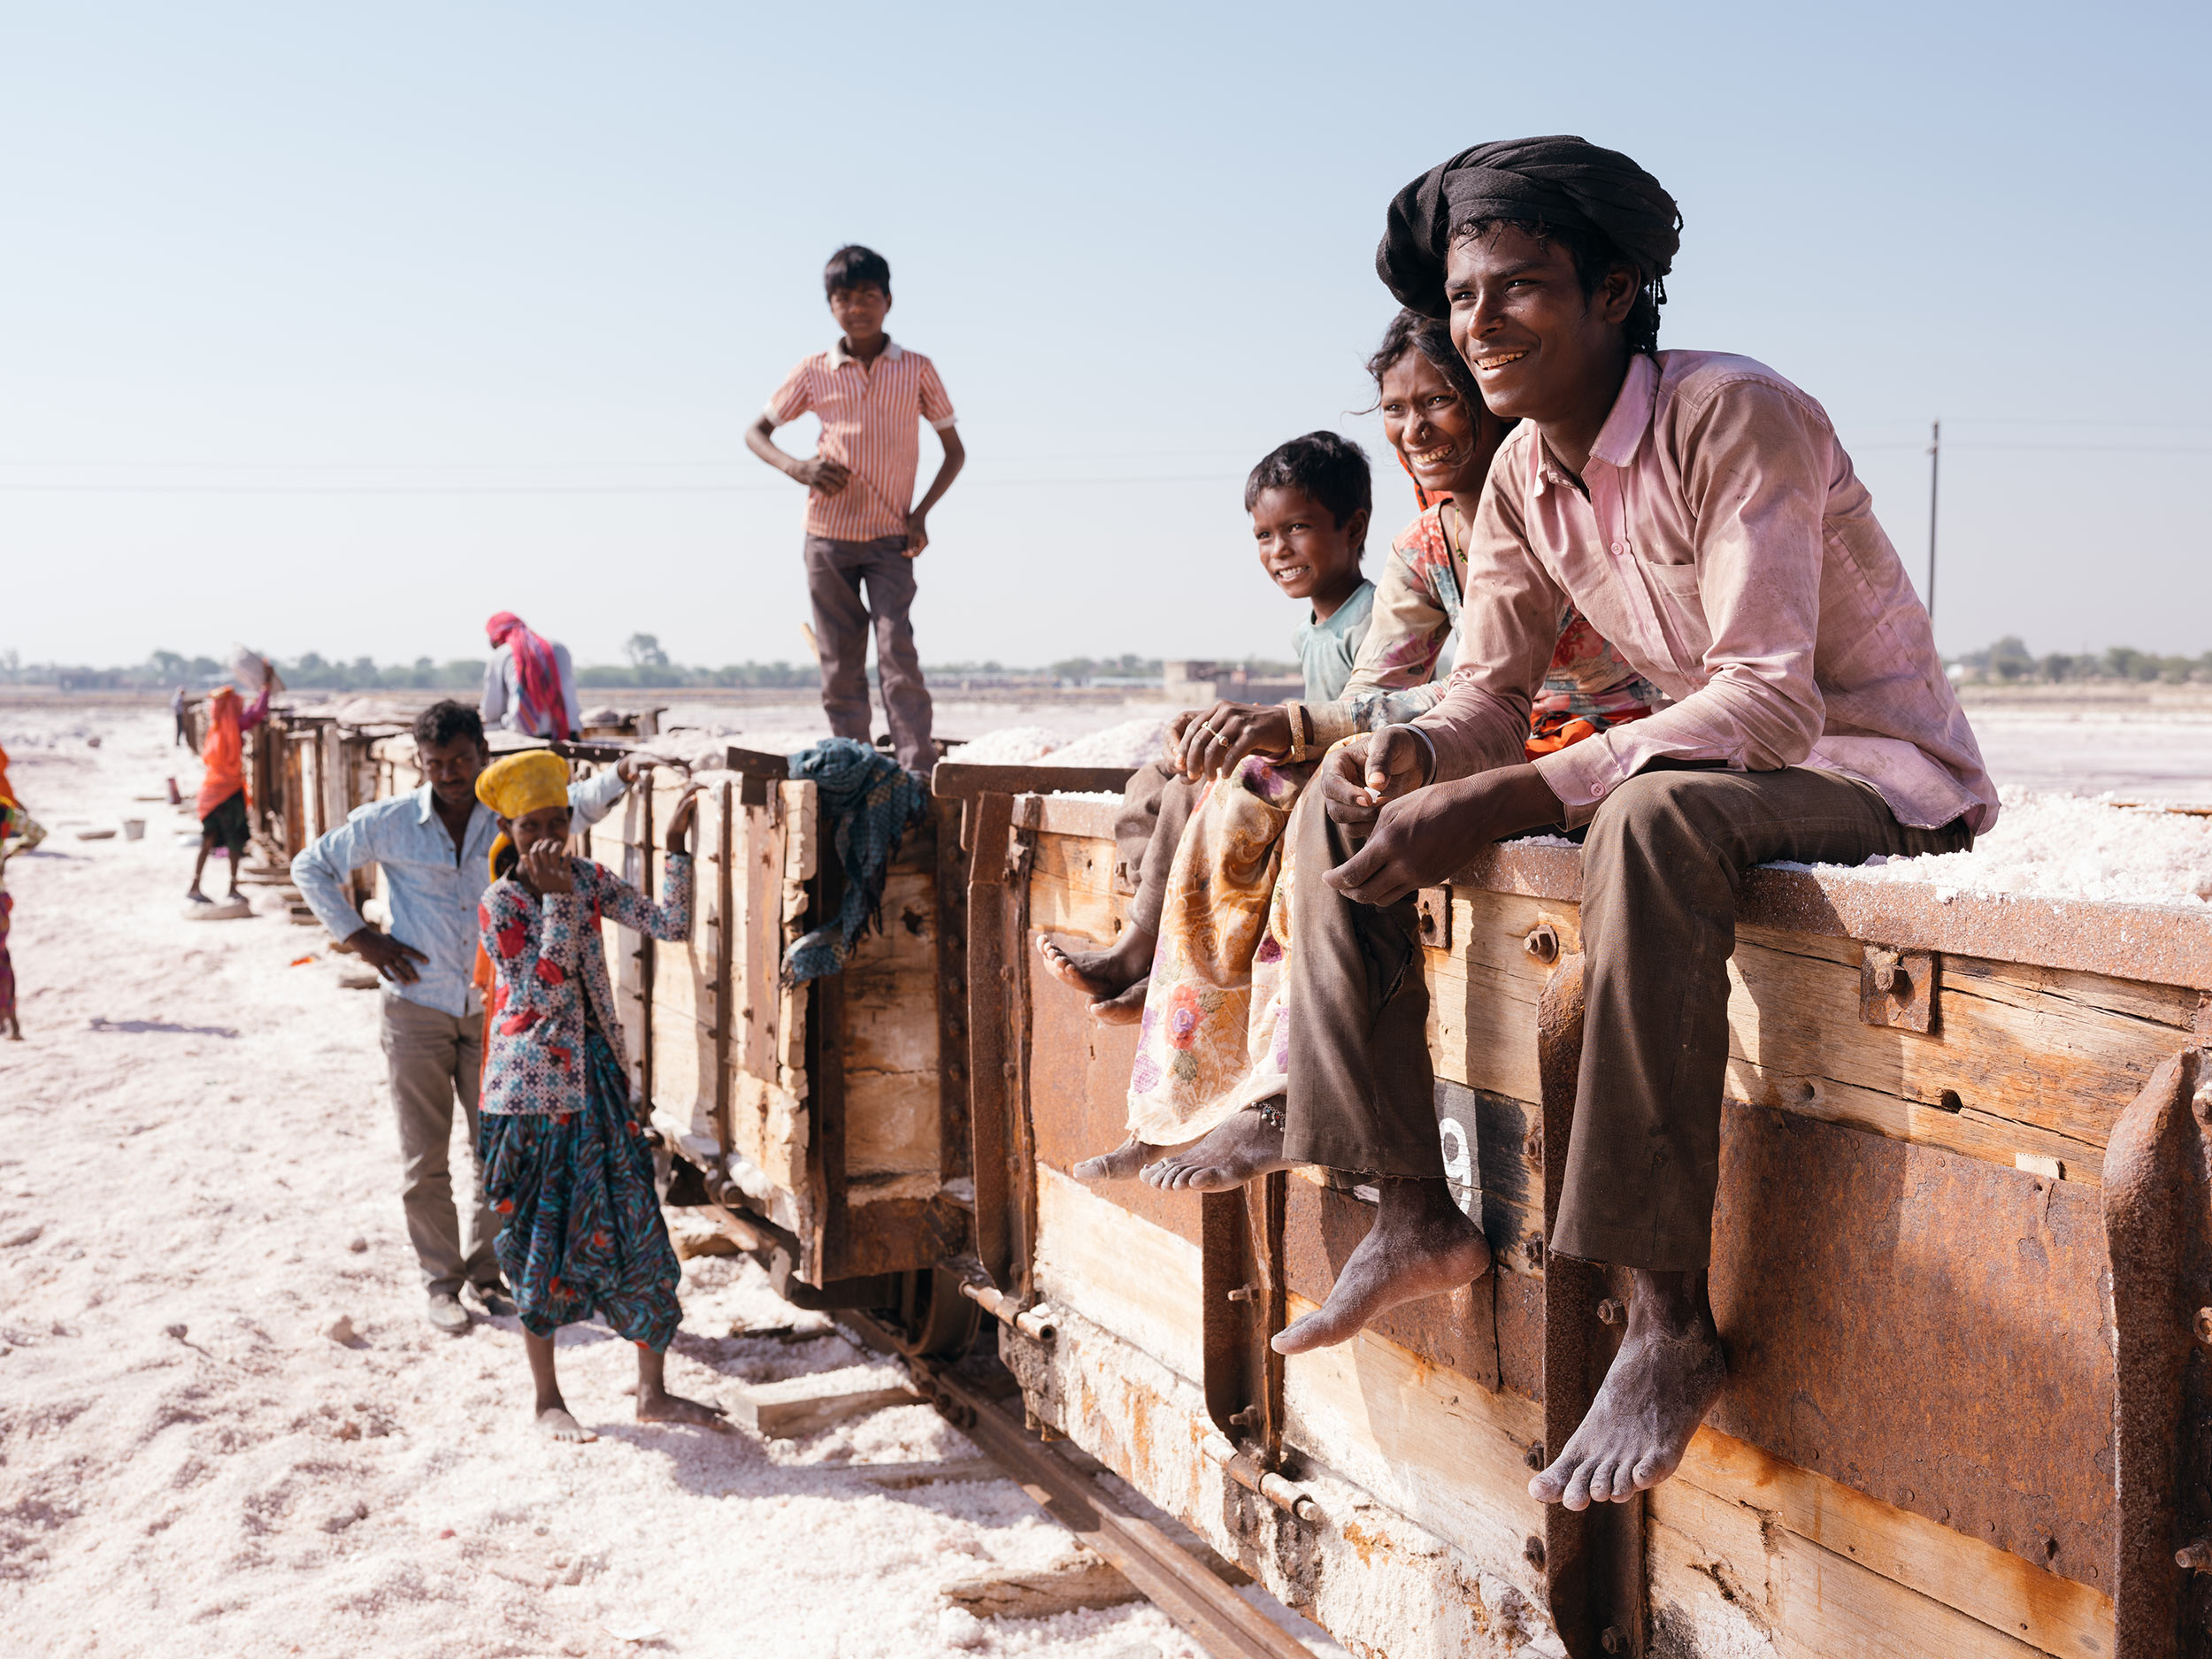 India_SaltFlats_0018_05639.jpg